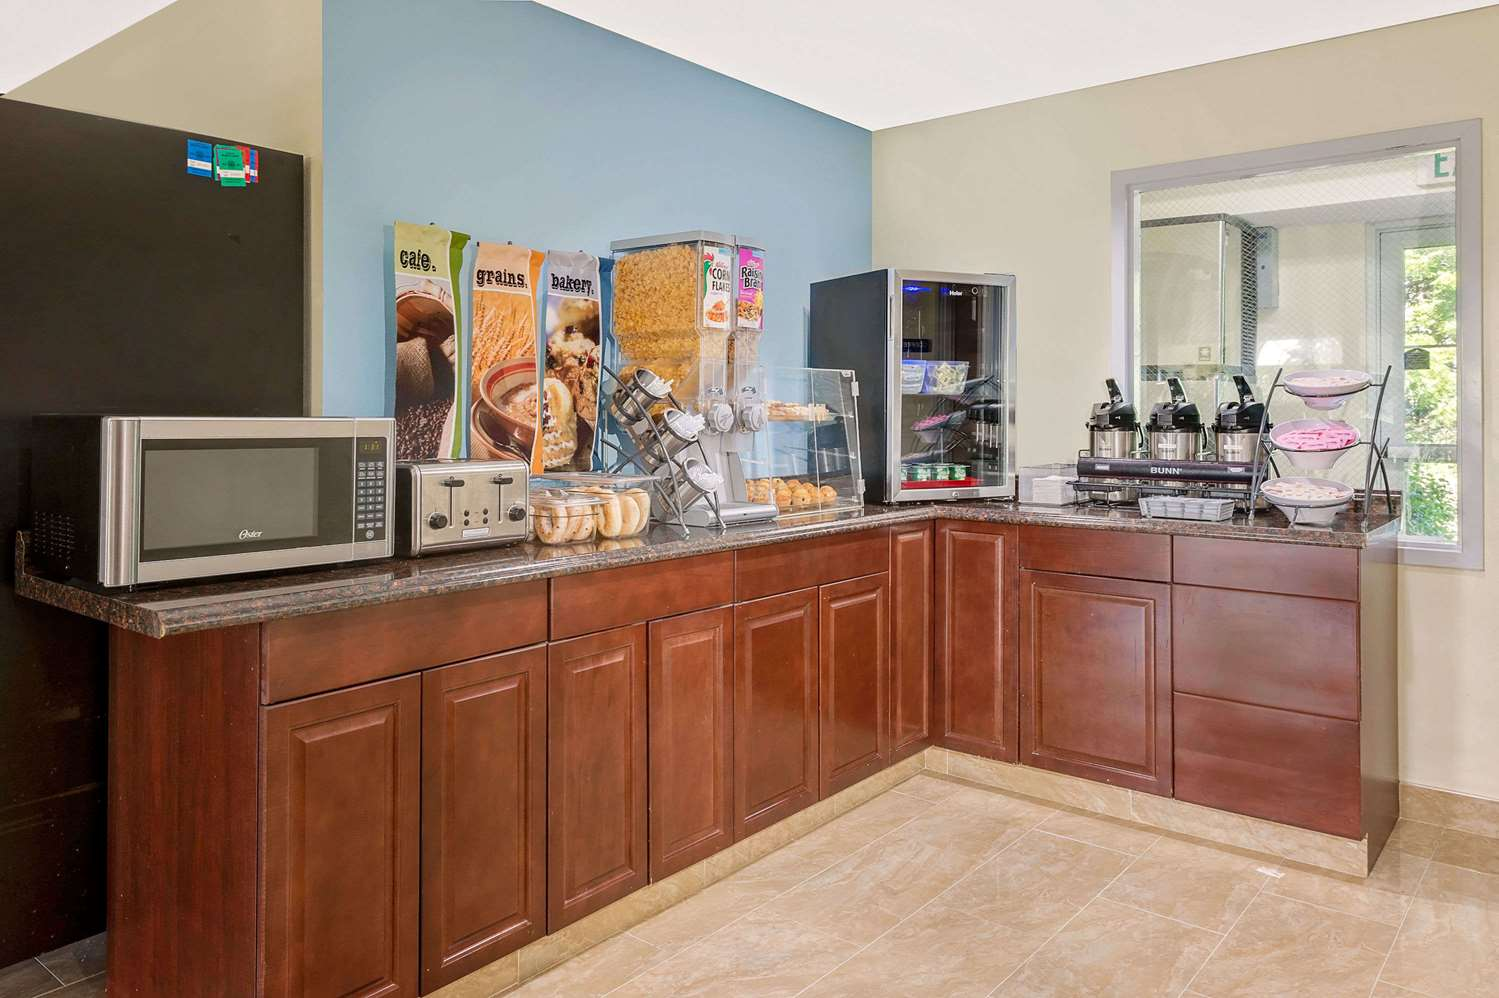 proam - Microtel Inn & Suites by Wyndham Hagerstown